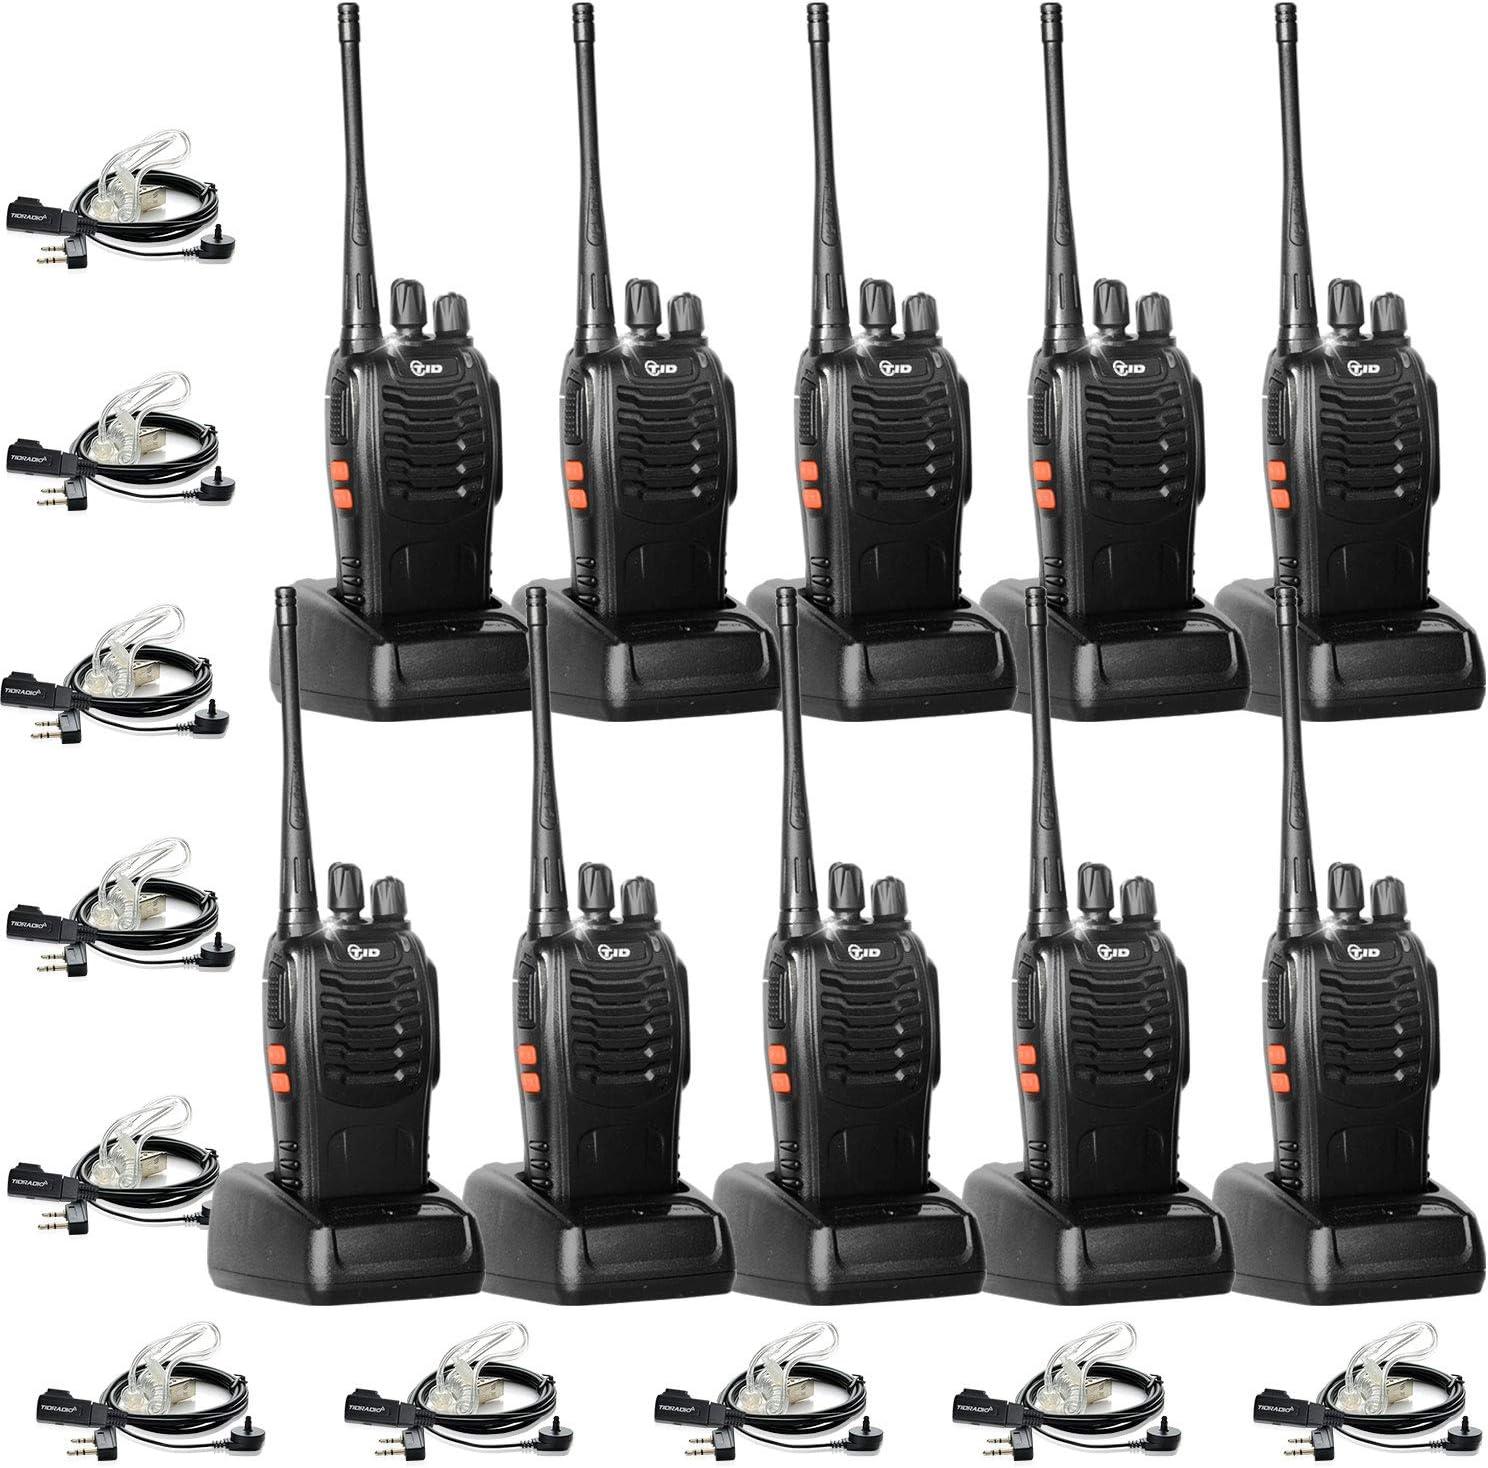 TID TD-V2 Two Way Radio Rechargeable 2 Way Radio UHF VOX Long Range 2-Way Radios Walkie Talkies for Adults with Secret Service Earpiece (10 Radio)